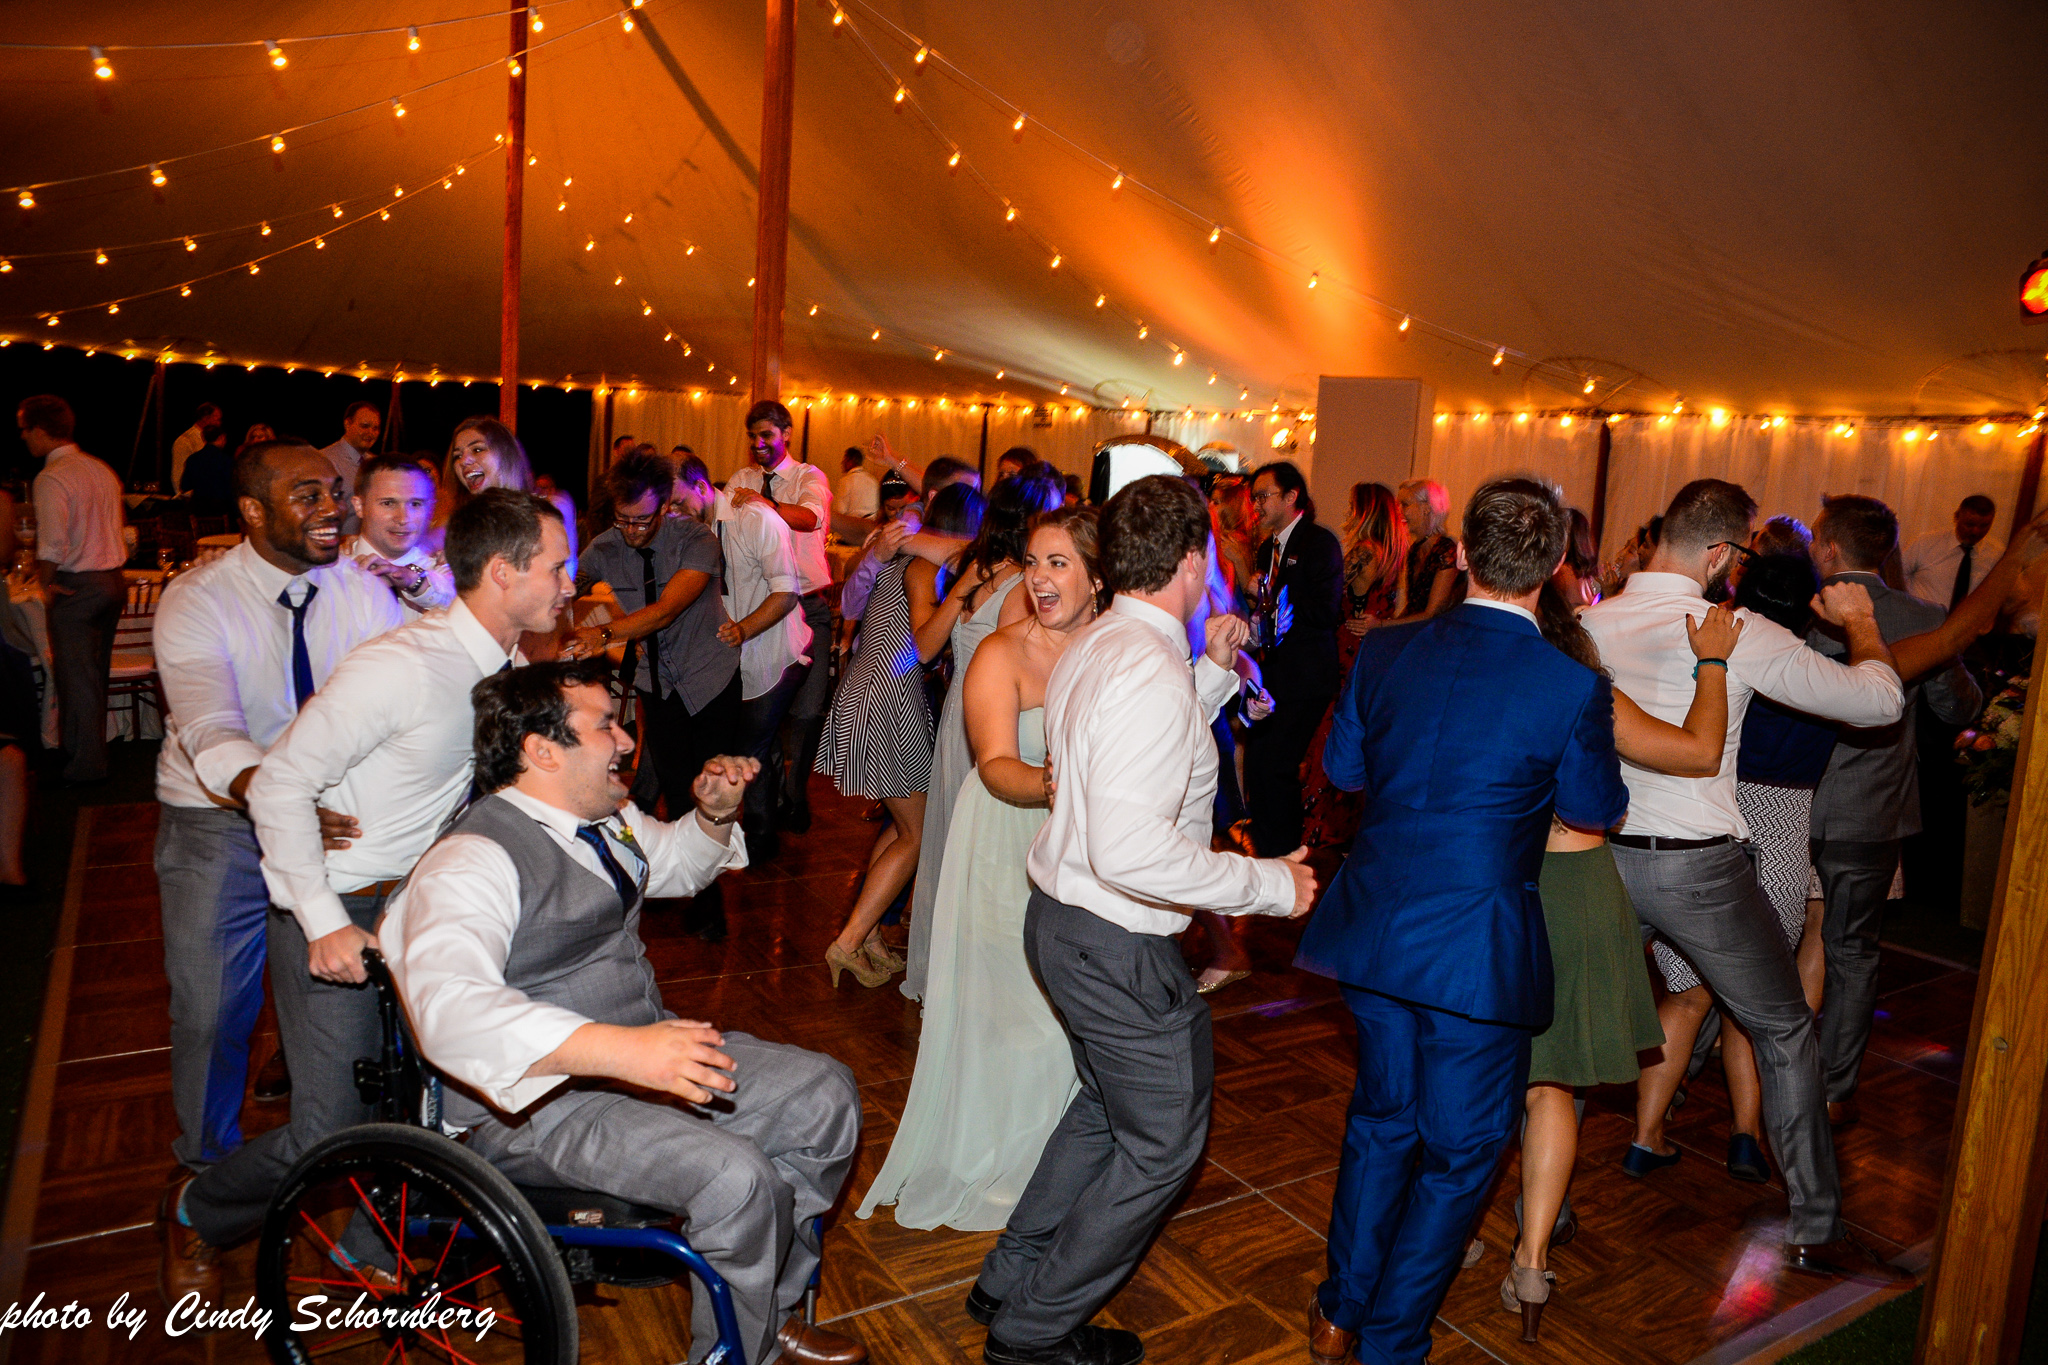 vineyard_weddings_Charlottesville_Virginia_026.jpg